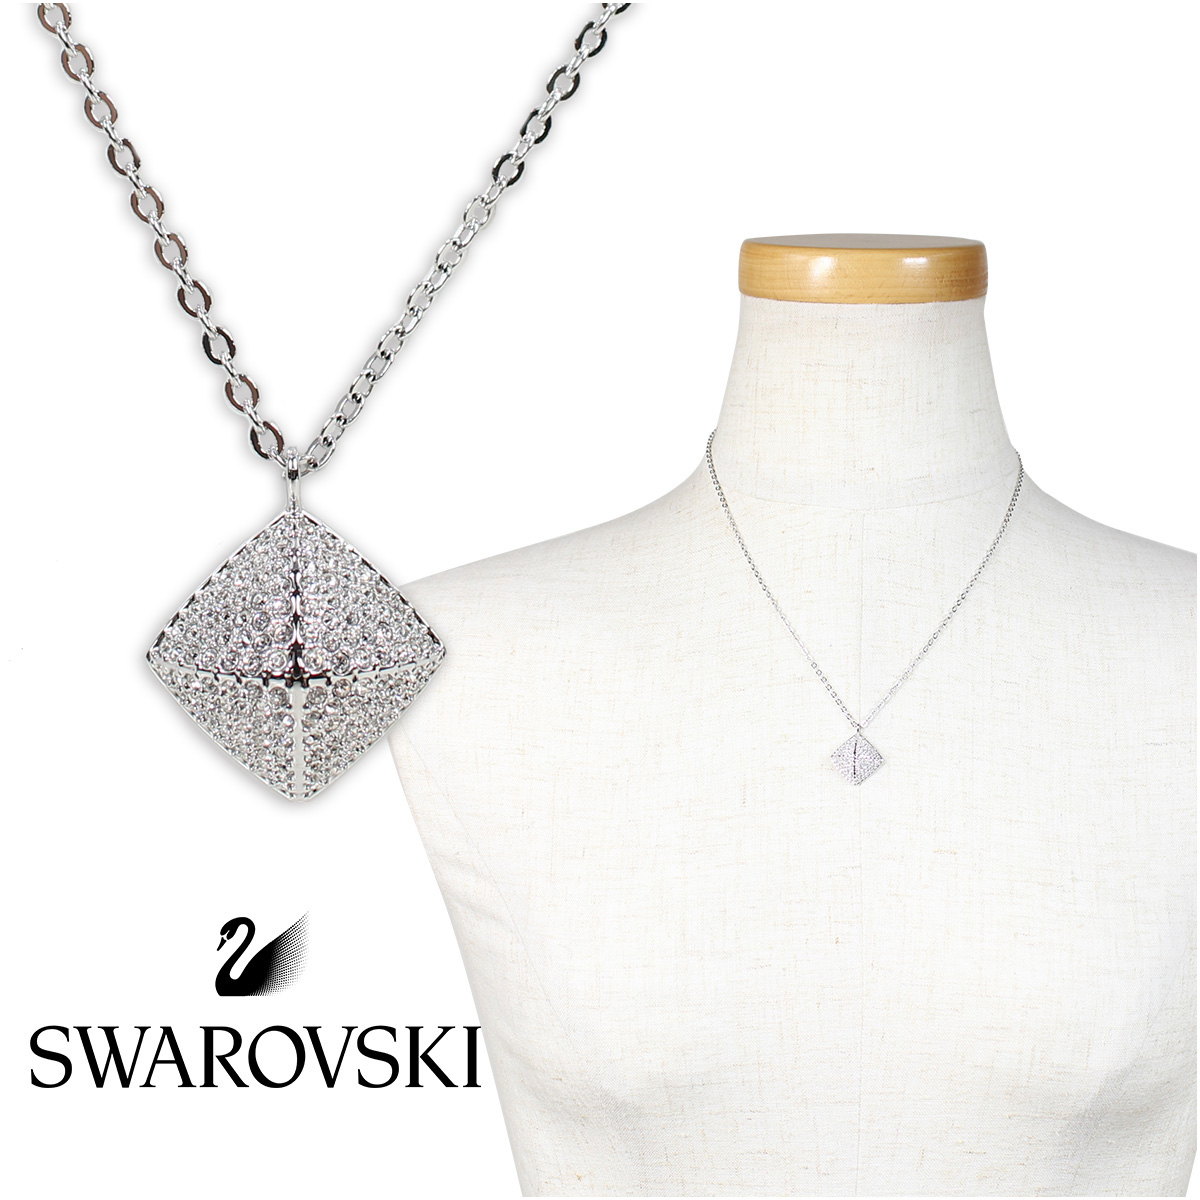 SWAROVSKI TACTIC スワロフスキー ネックレス レディース シルバー 5017069